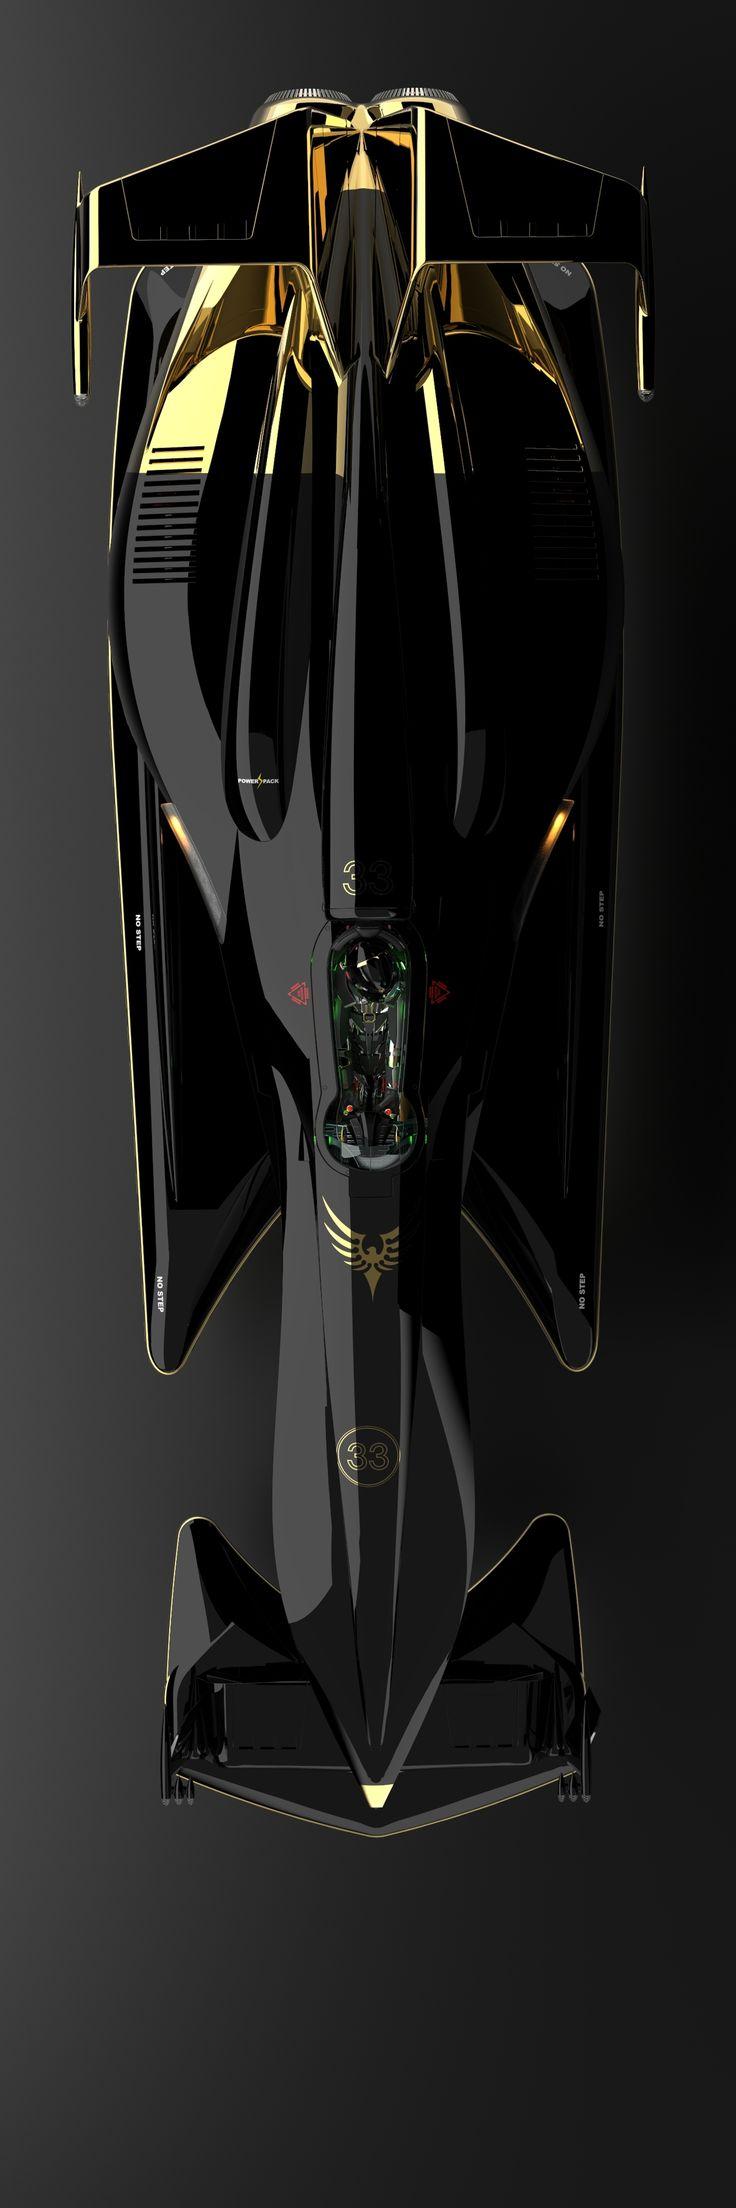 Tommy Thorn Racer concepto. por Row Zero - Simon Williamson→